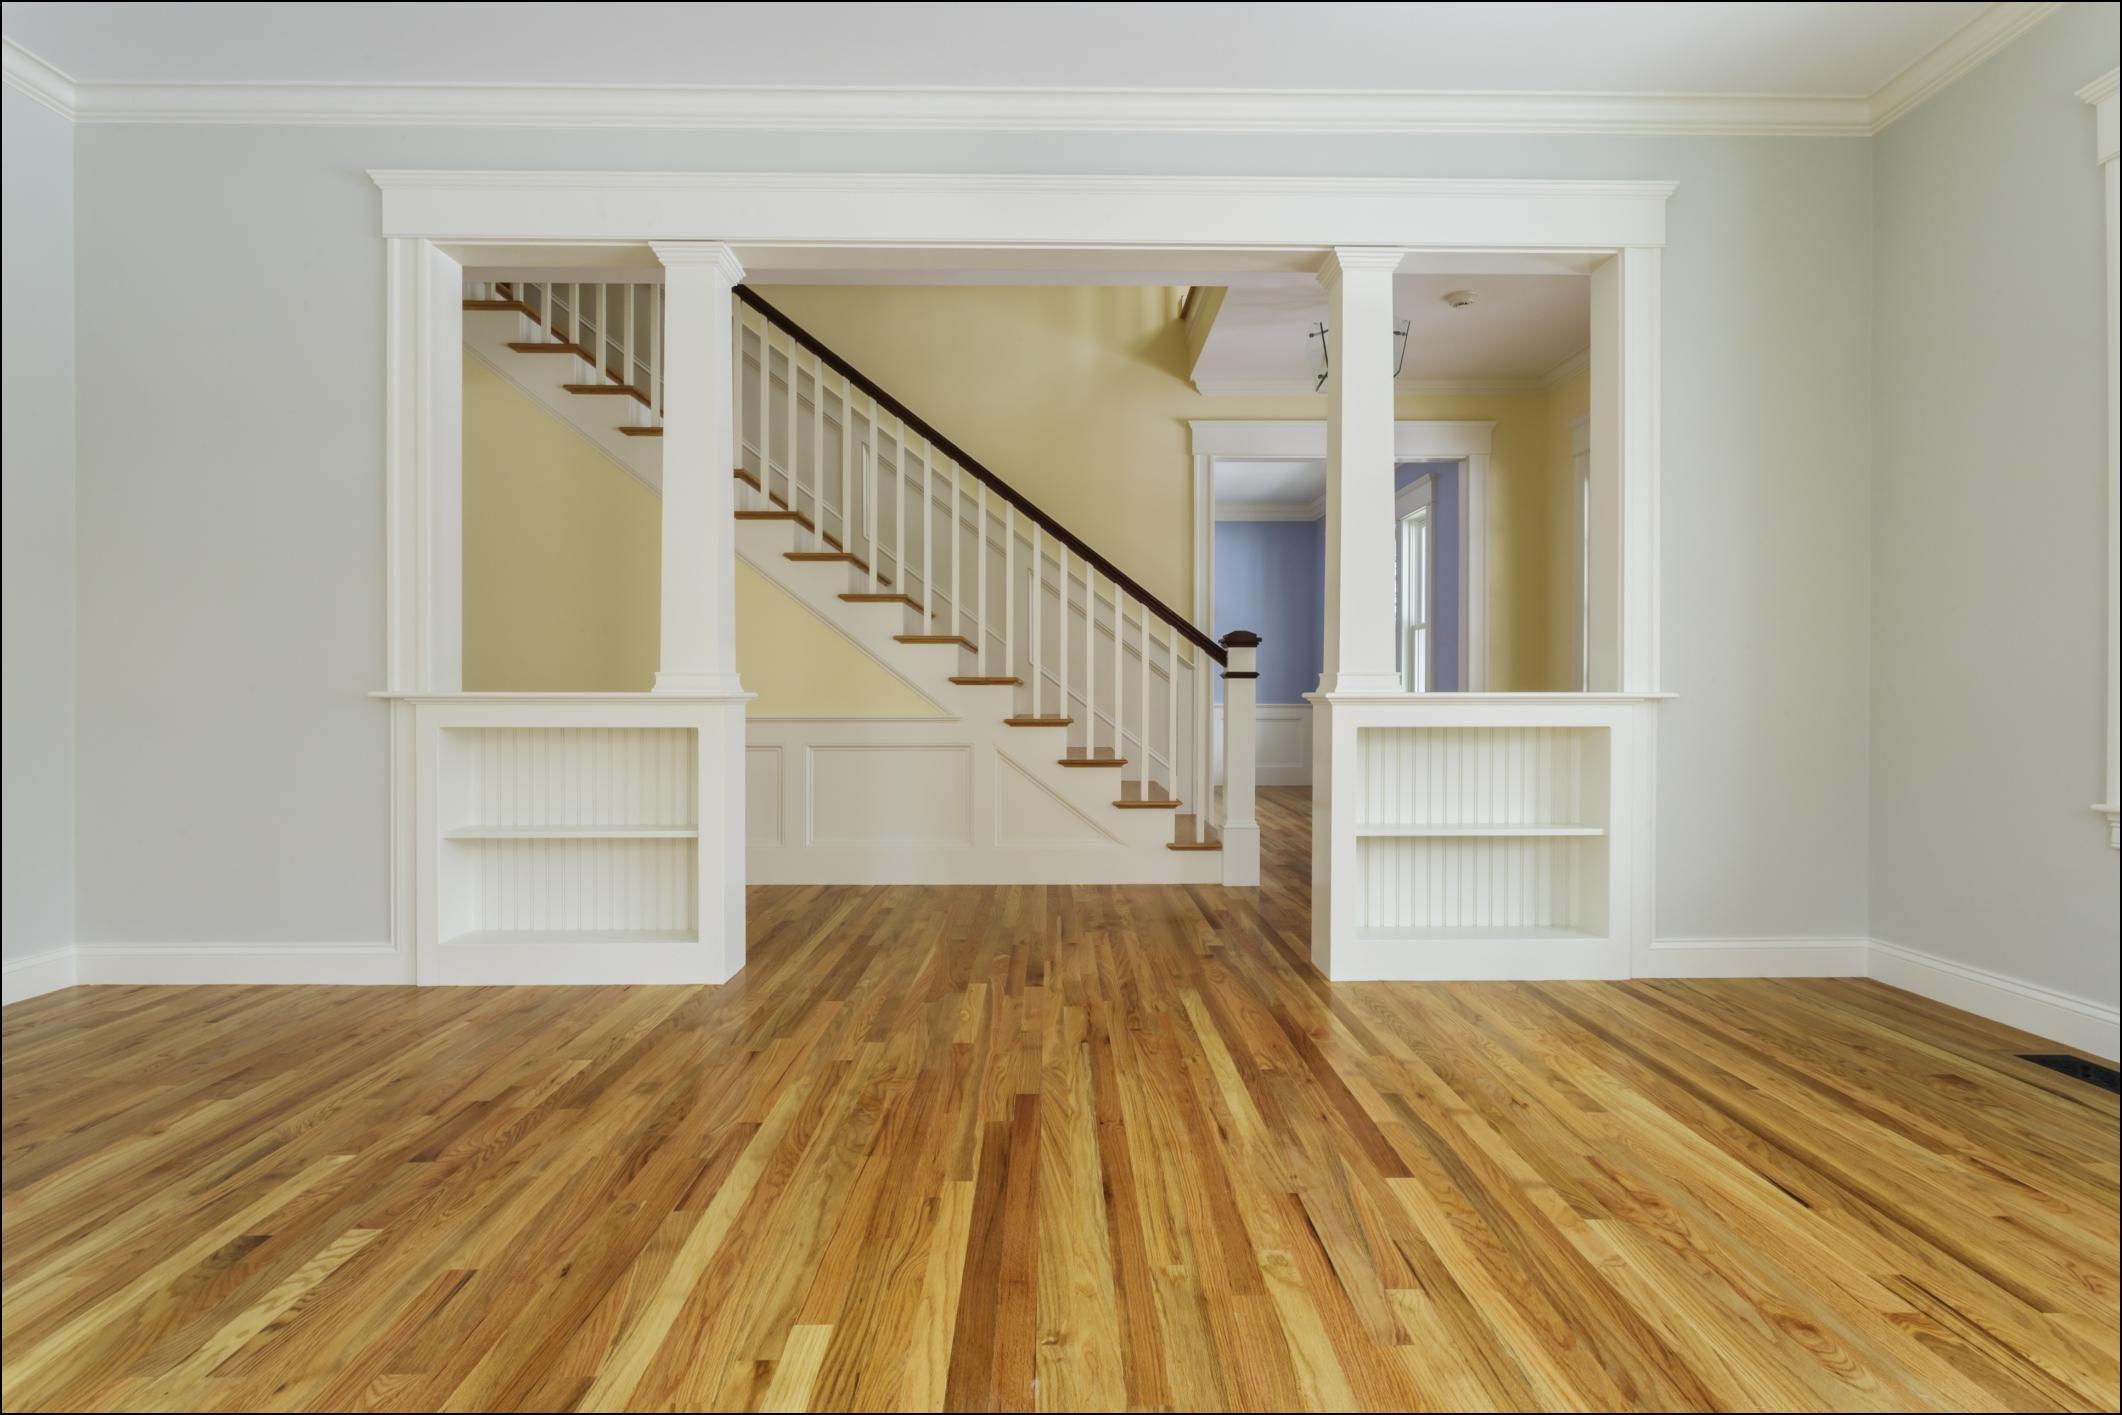 hardwood flooring toronto installation price of hardwood flooring suppliers france flooring ideas with hardwood flooring cost for 1000 square feet stock guide to solid hardwood floors of hardwood flooring